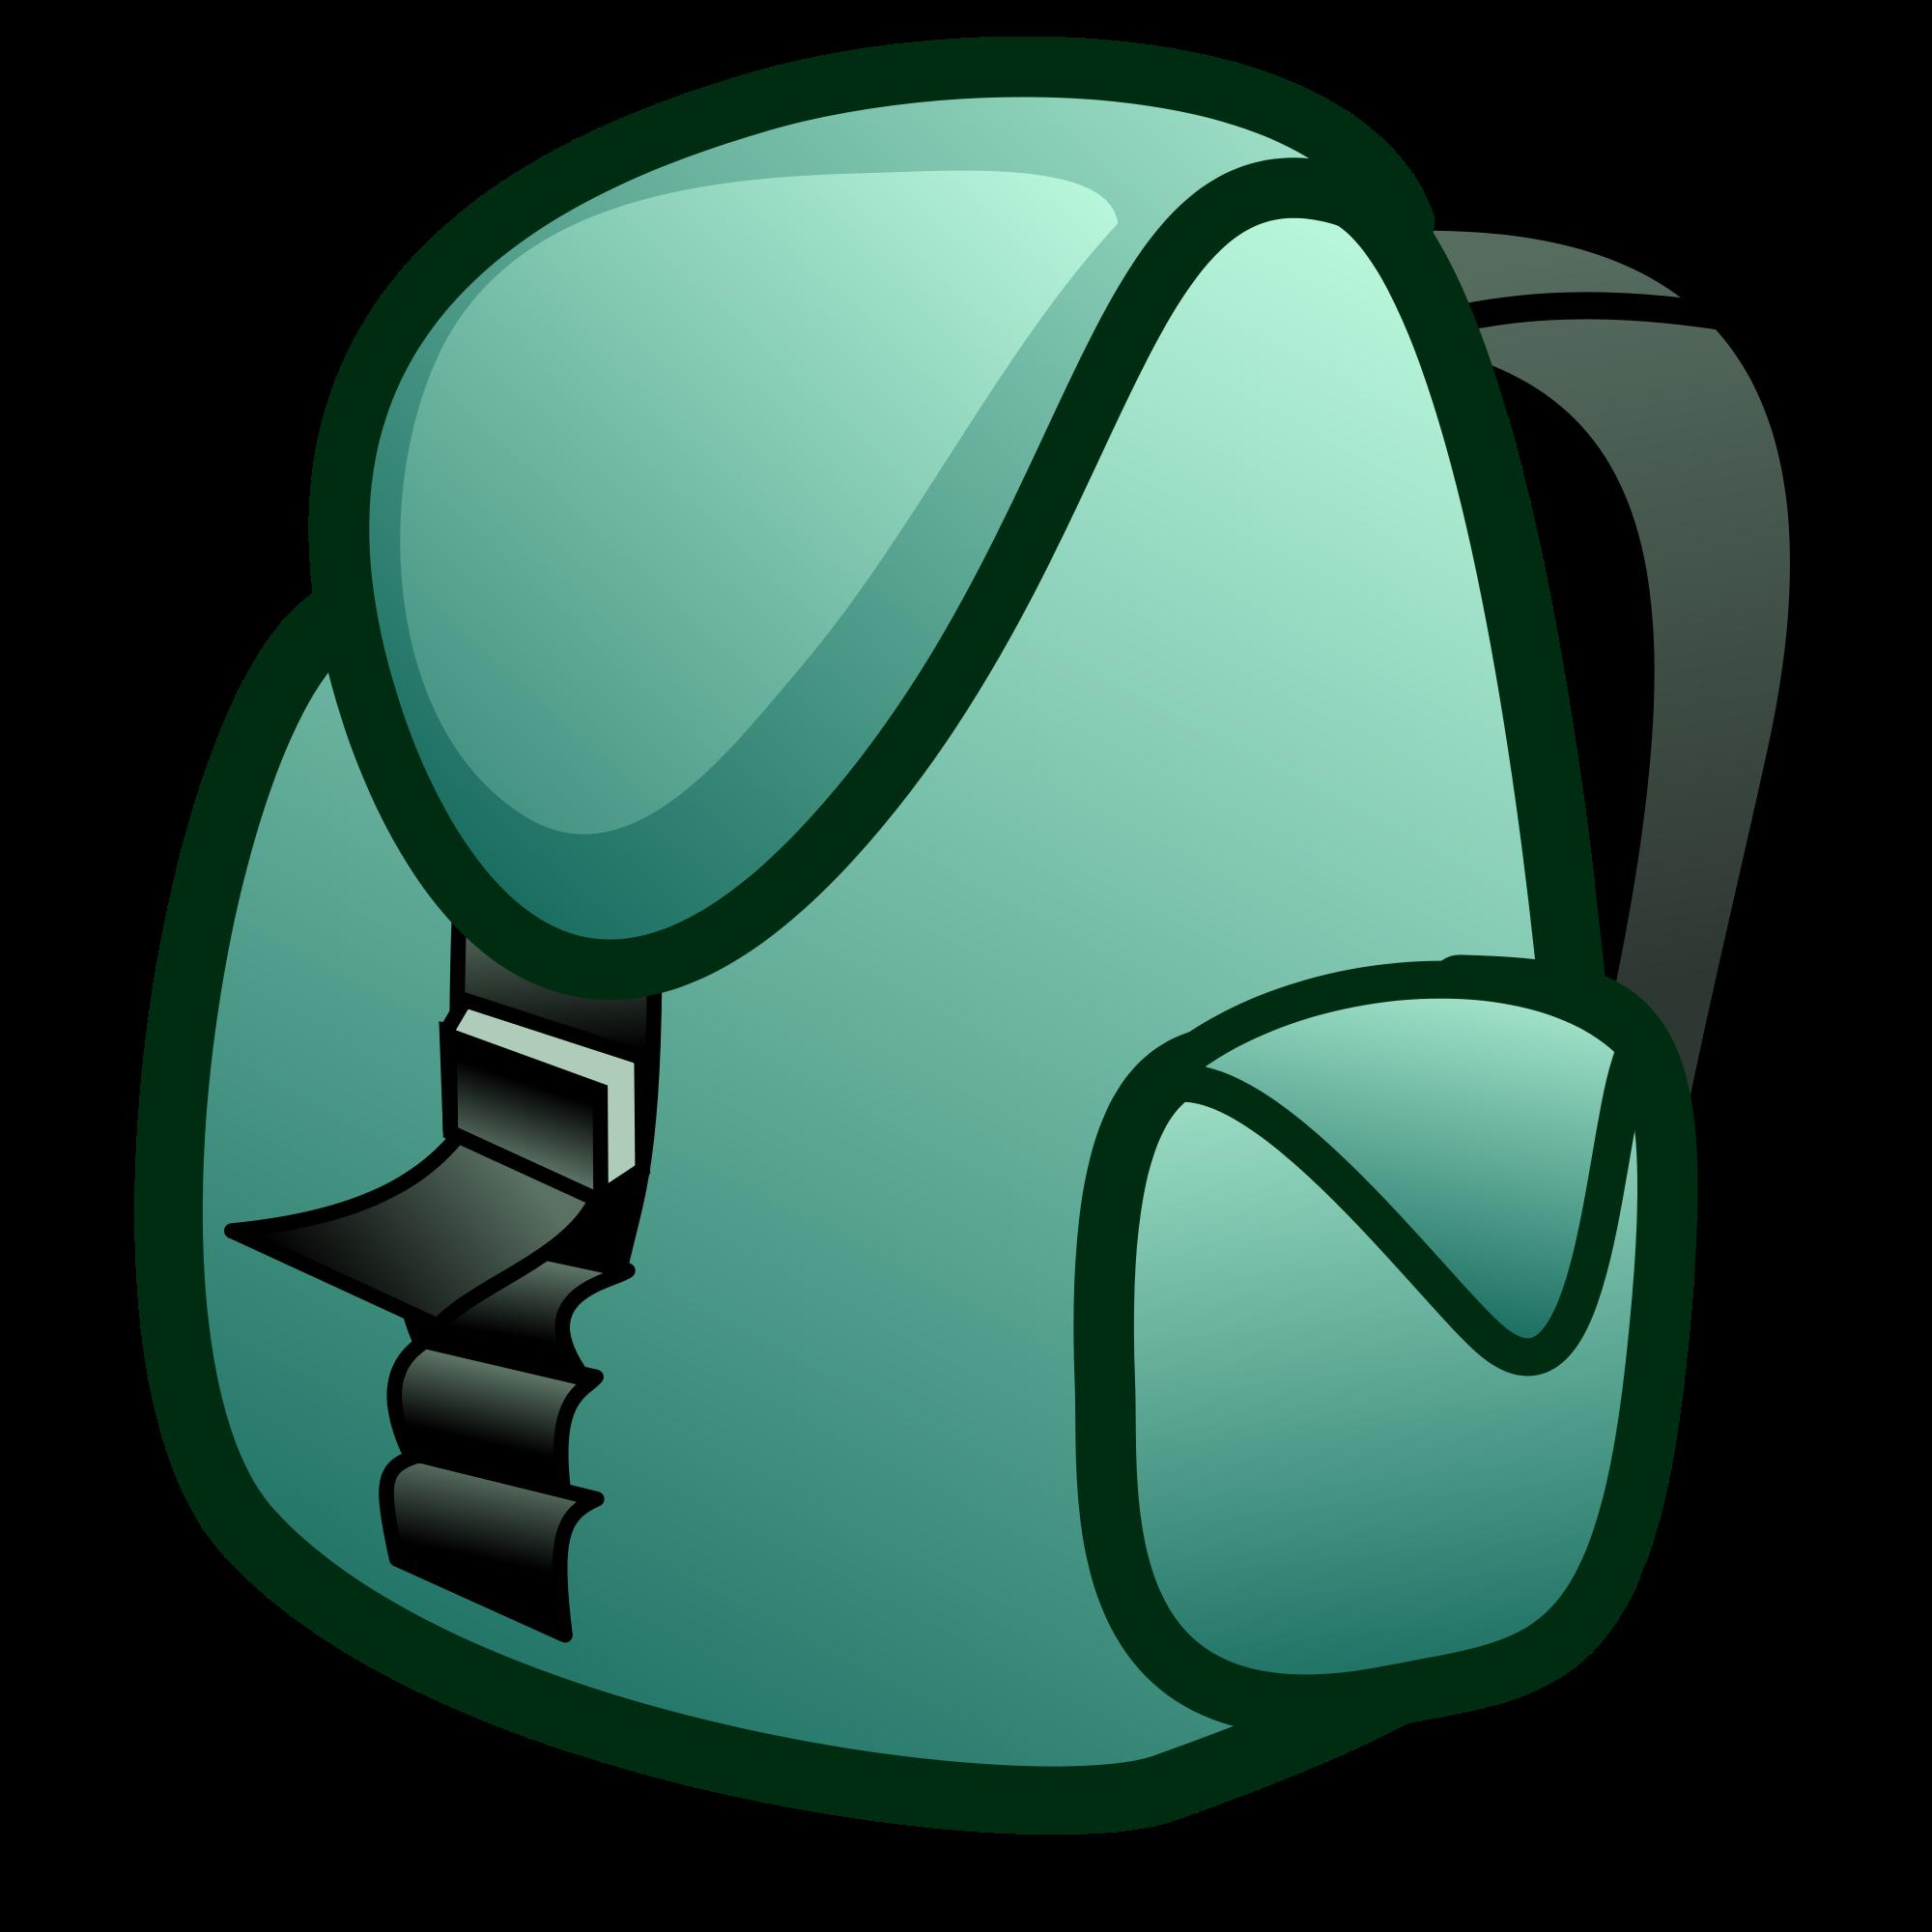 New SVG image - Backpack PNG